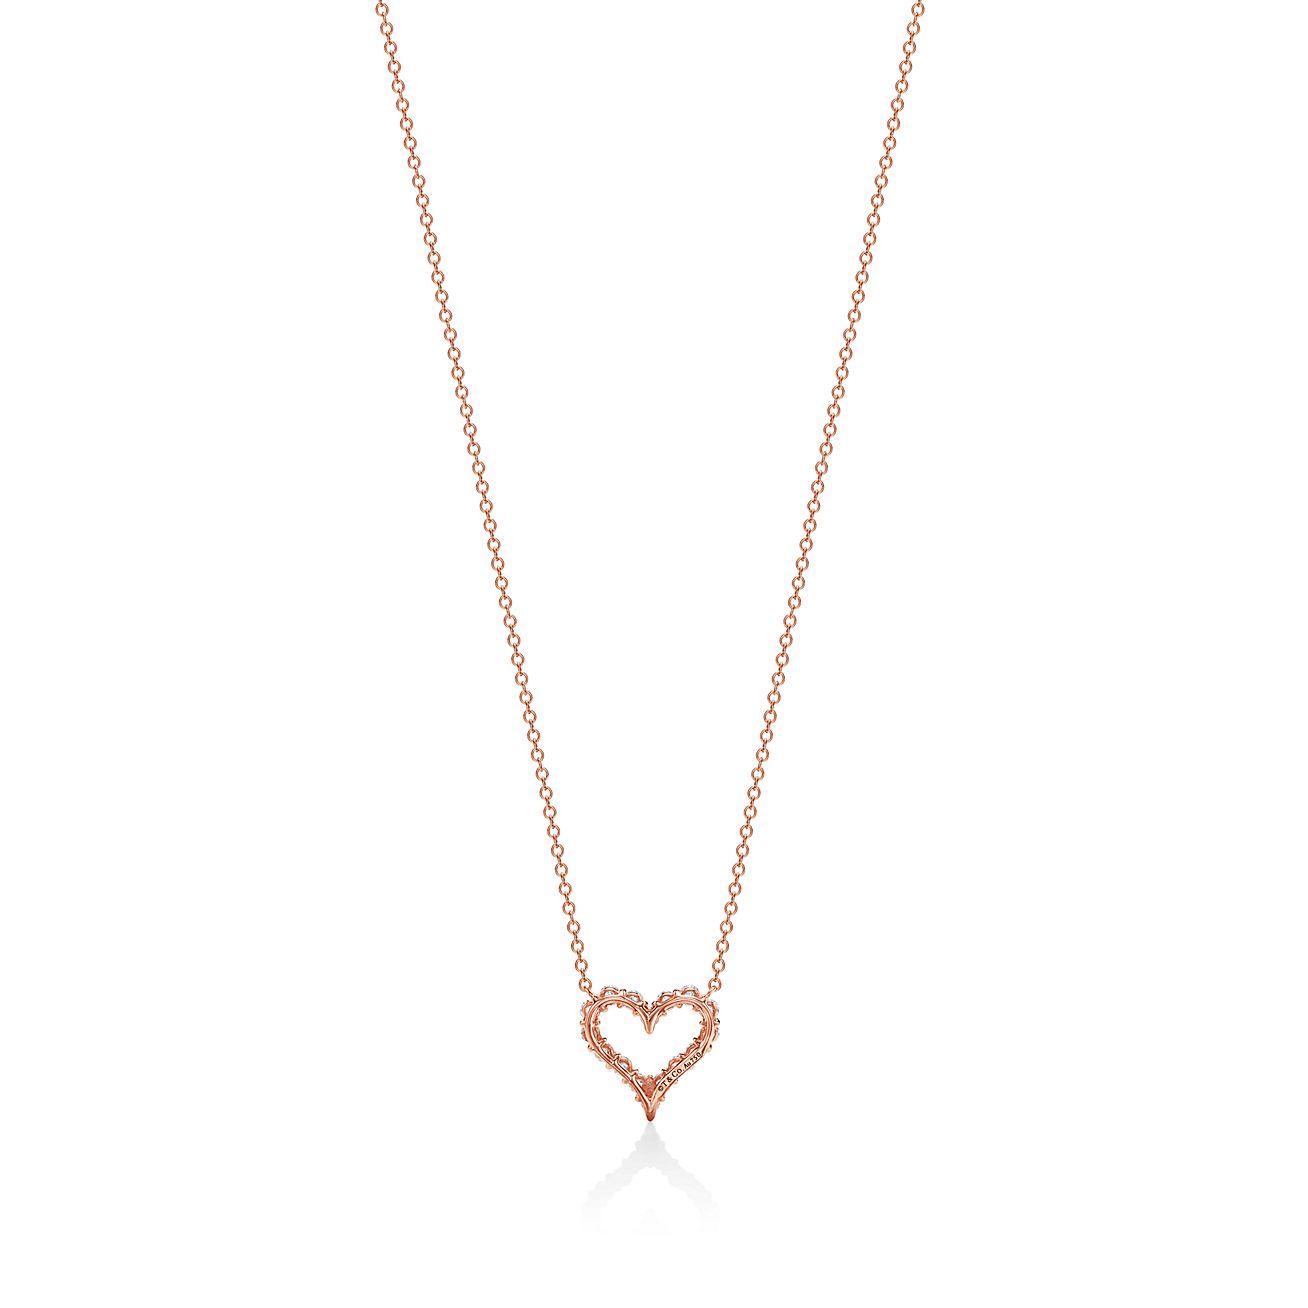 Tiny Diamond Heart Necklace  Mini Diamond Hear Pendant in 14k Gold  Diamond Heart Necklace Micro Pave Setting .10ctw